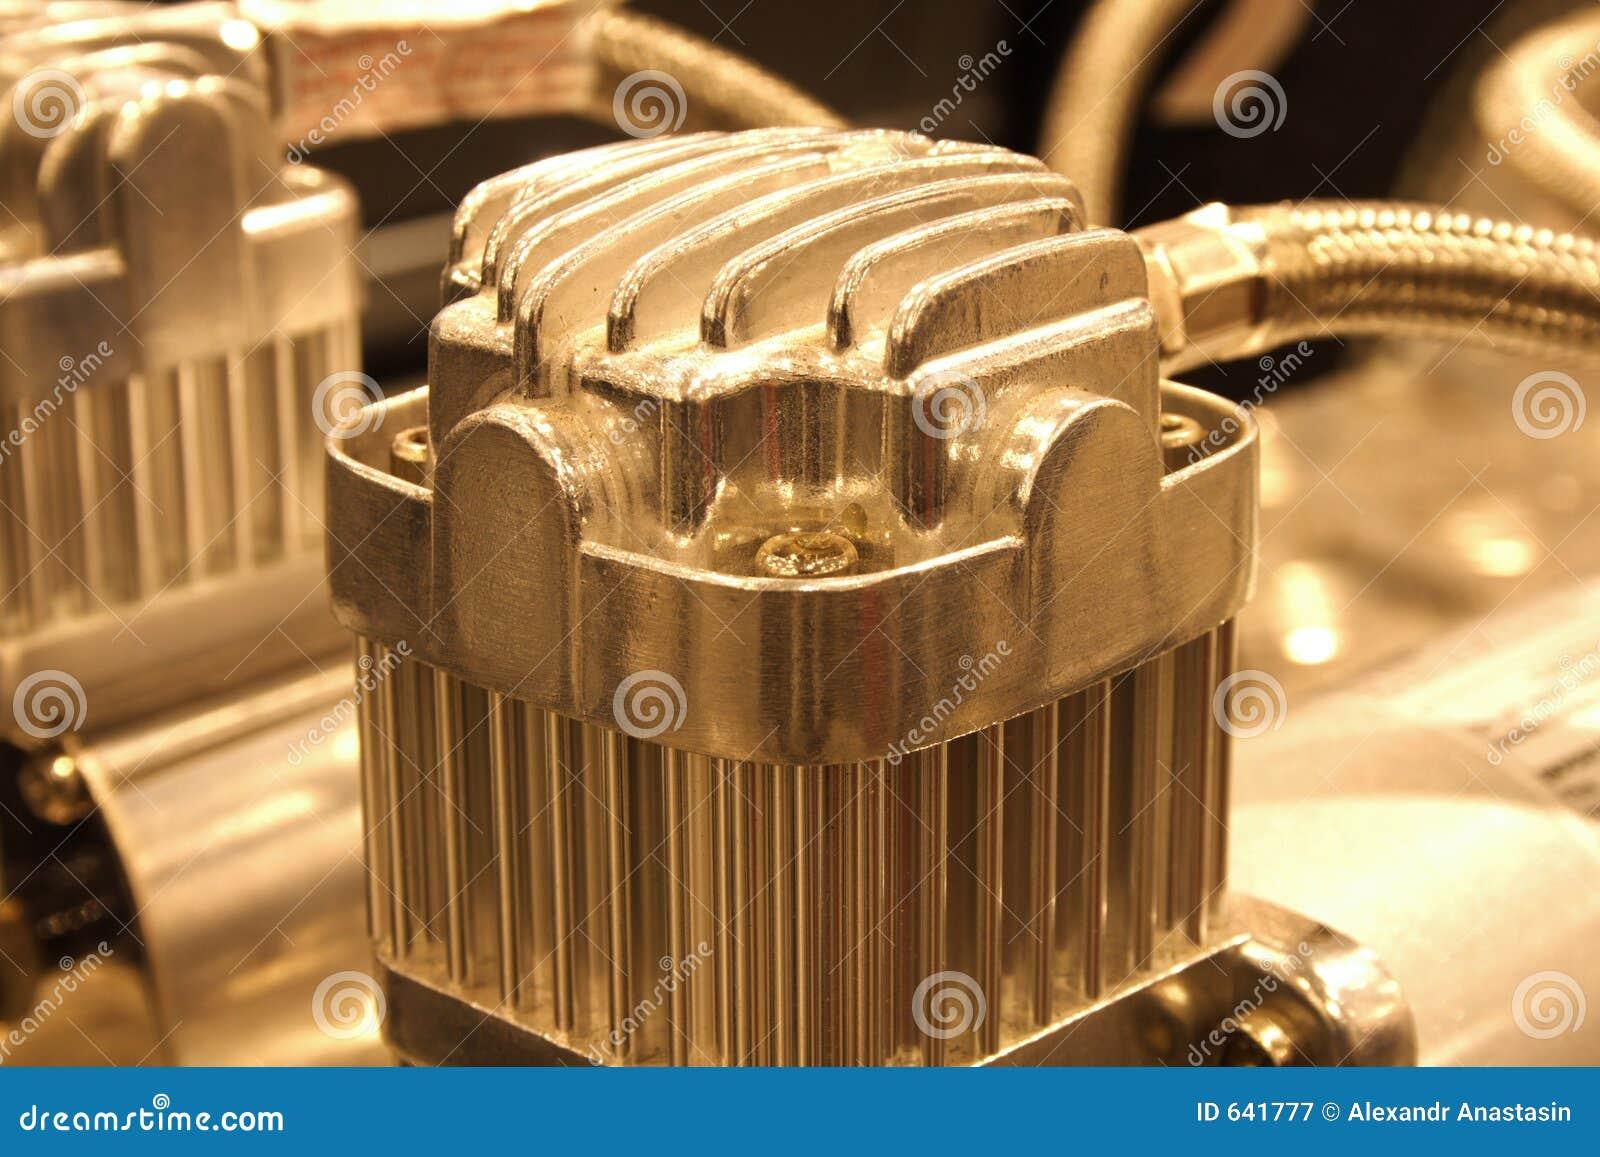 Download компрессор стоковое изображение. изображение насчитывающей металлическо - 641777